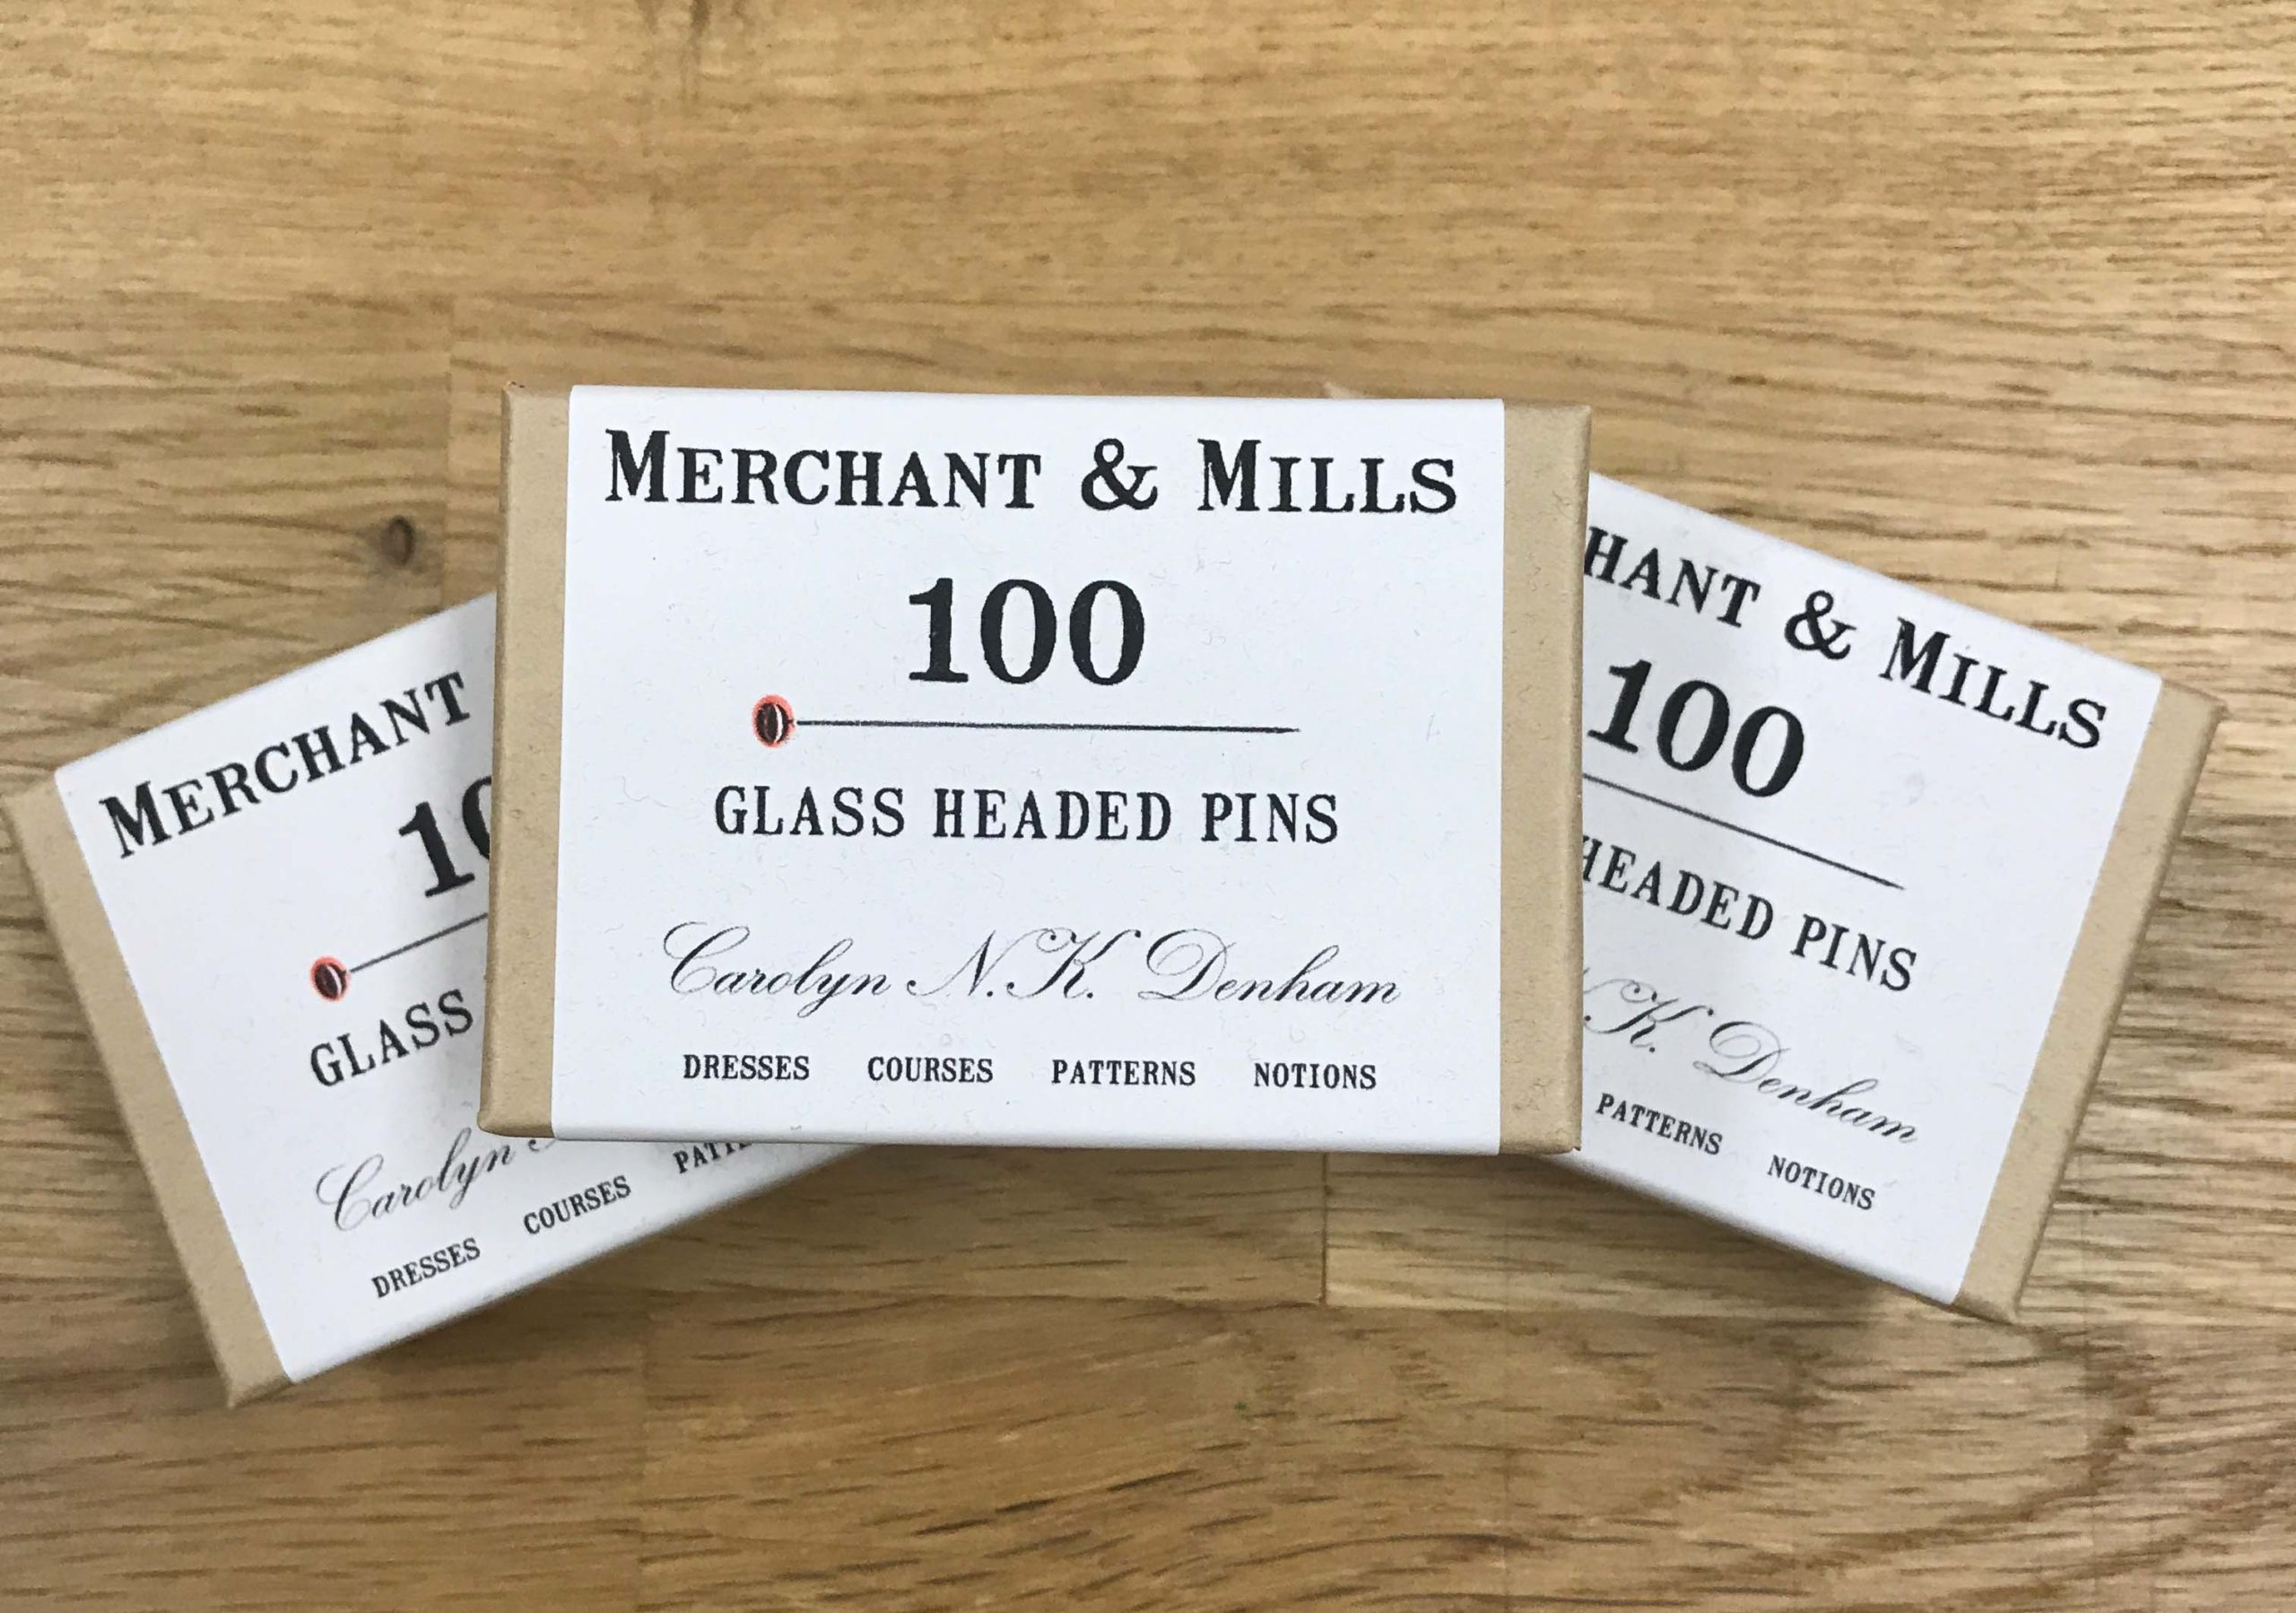 Glass Headed Pins by Merchant & Mills